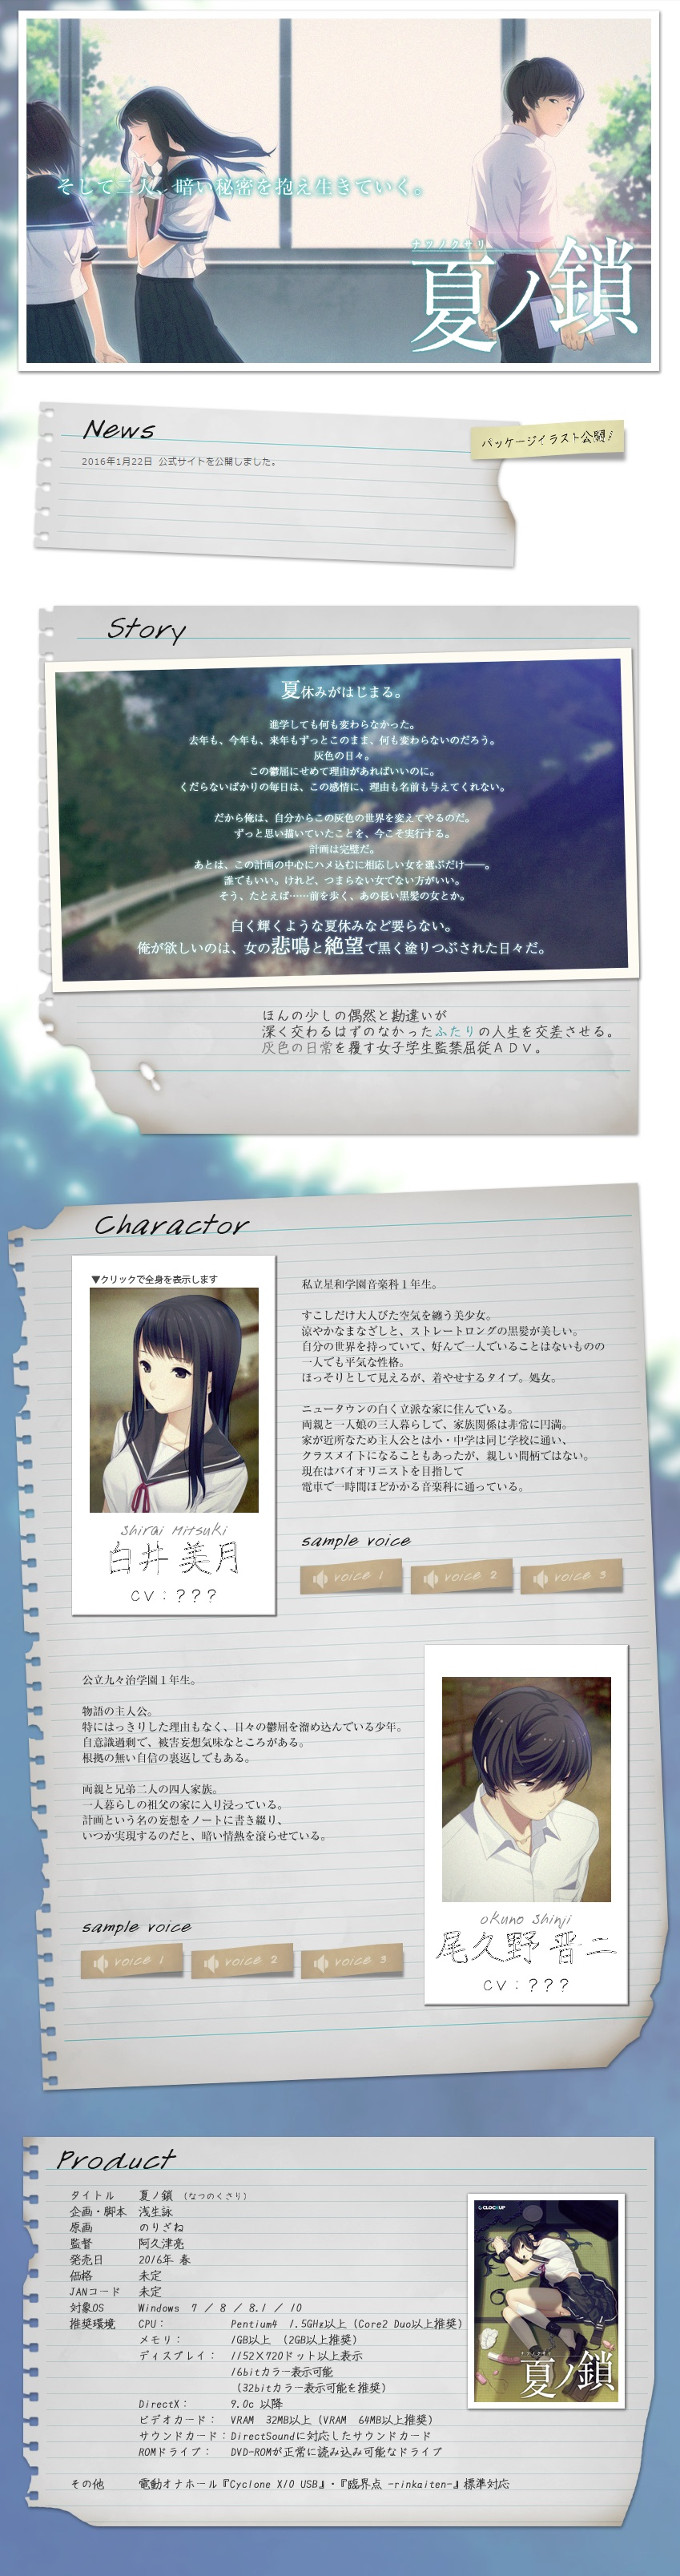 screencapture-clockup-net-natu-1453497725685.jpg